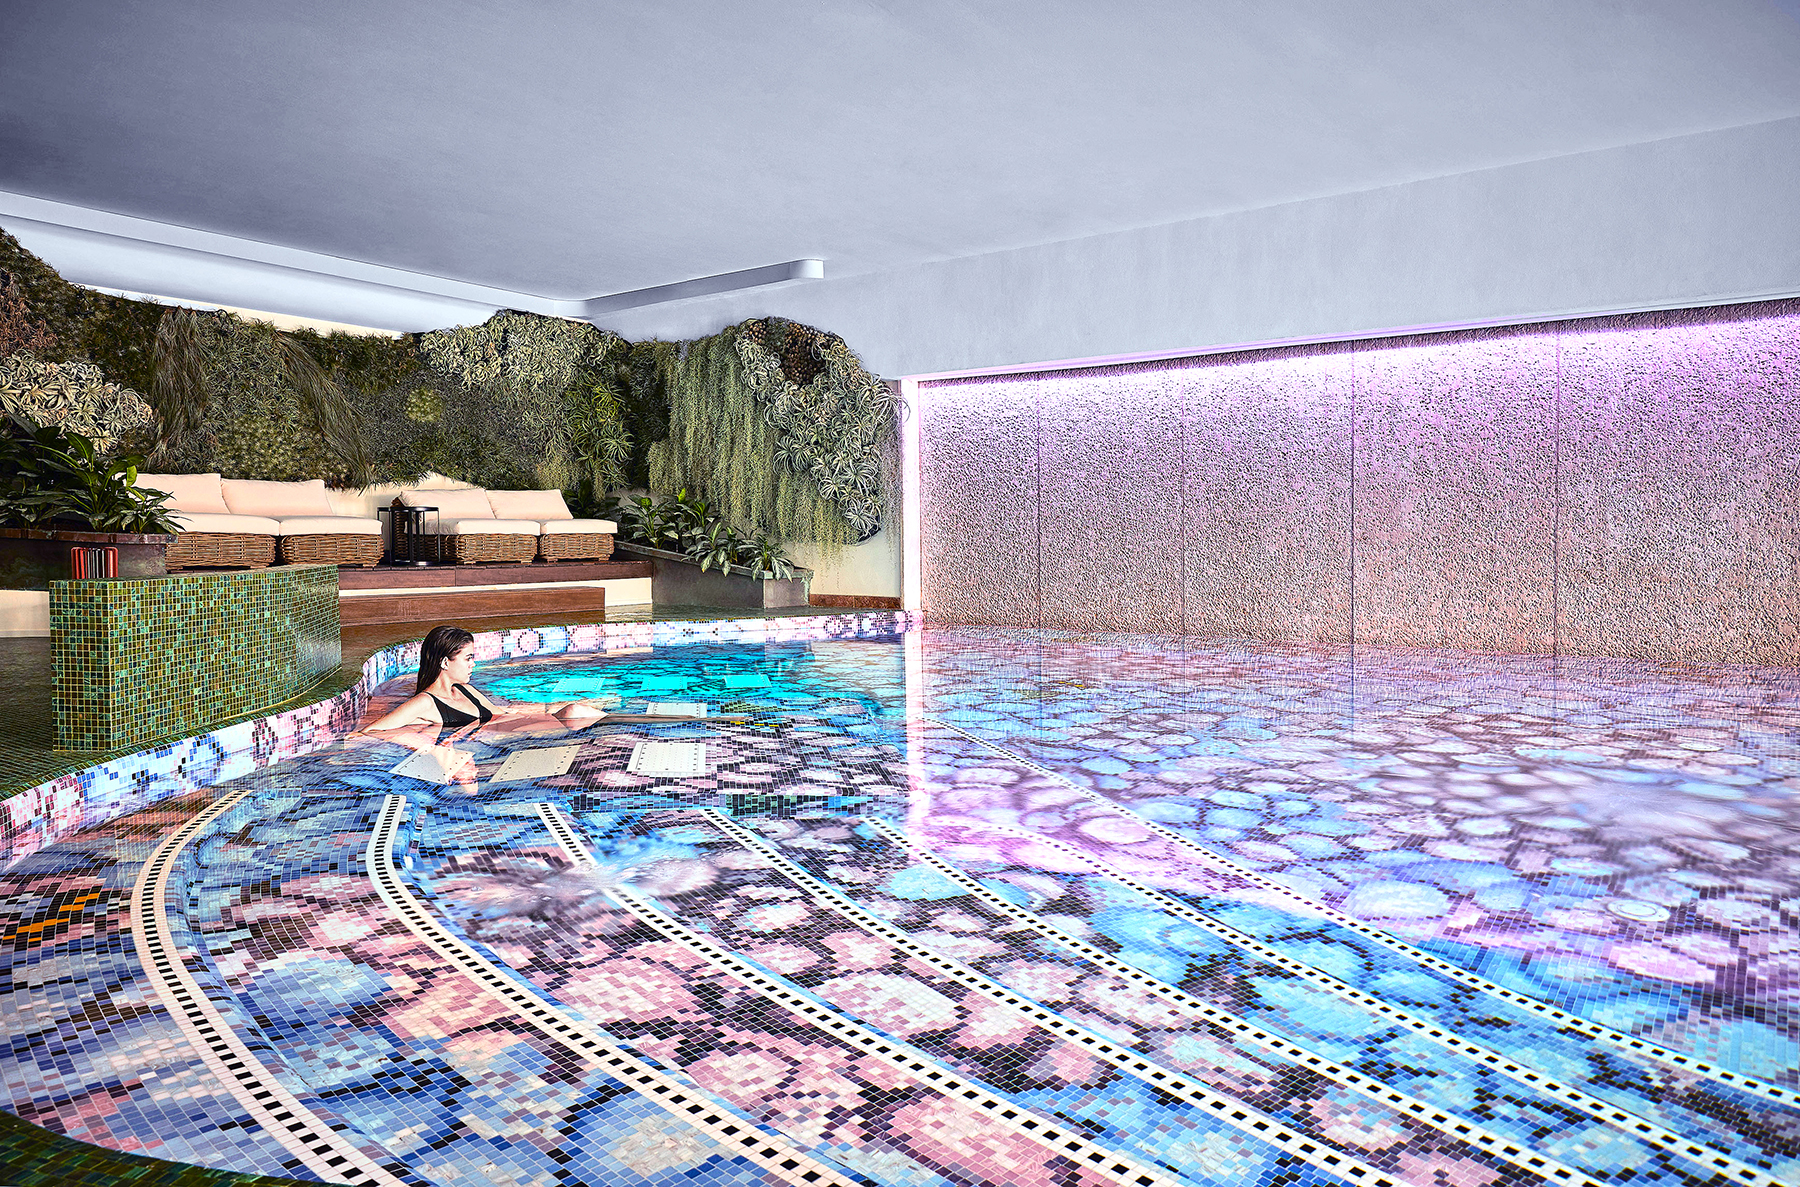 BISAZZA Mosaic ORTENSIA decoration design Fornasetti POOL at Relais L'ALBERETA